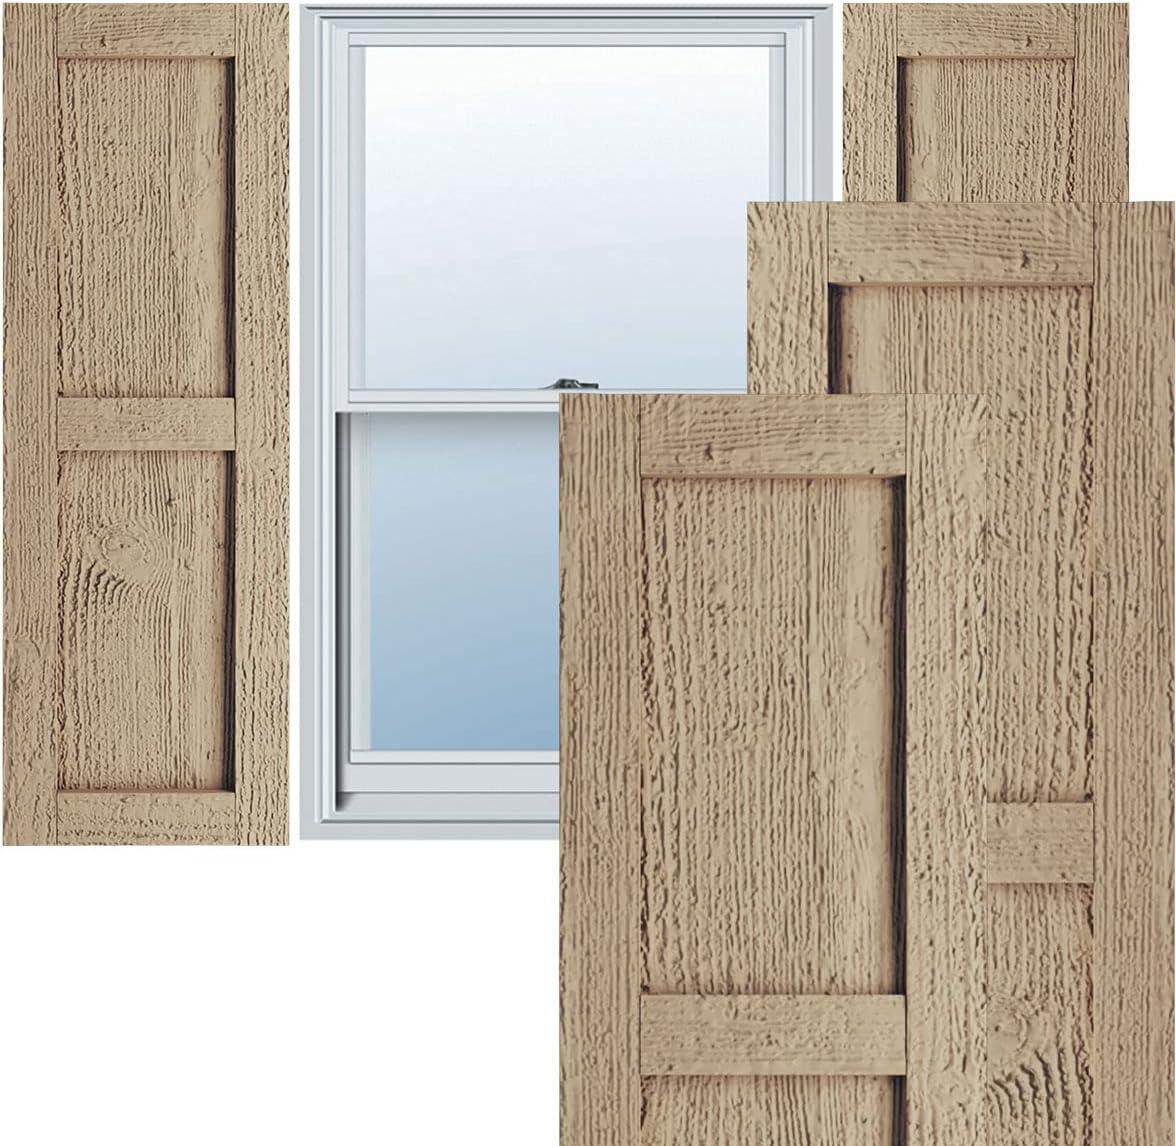 Ekena Millwork SHULVRW OFFicial shop Faux Wood Per cheap Two Pair Rustic Shutters